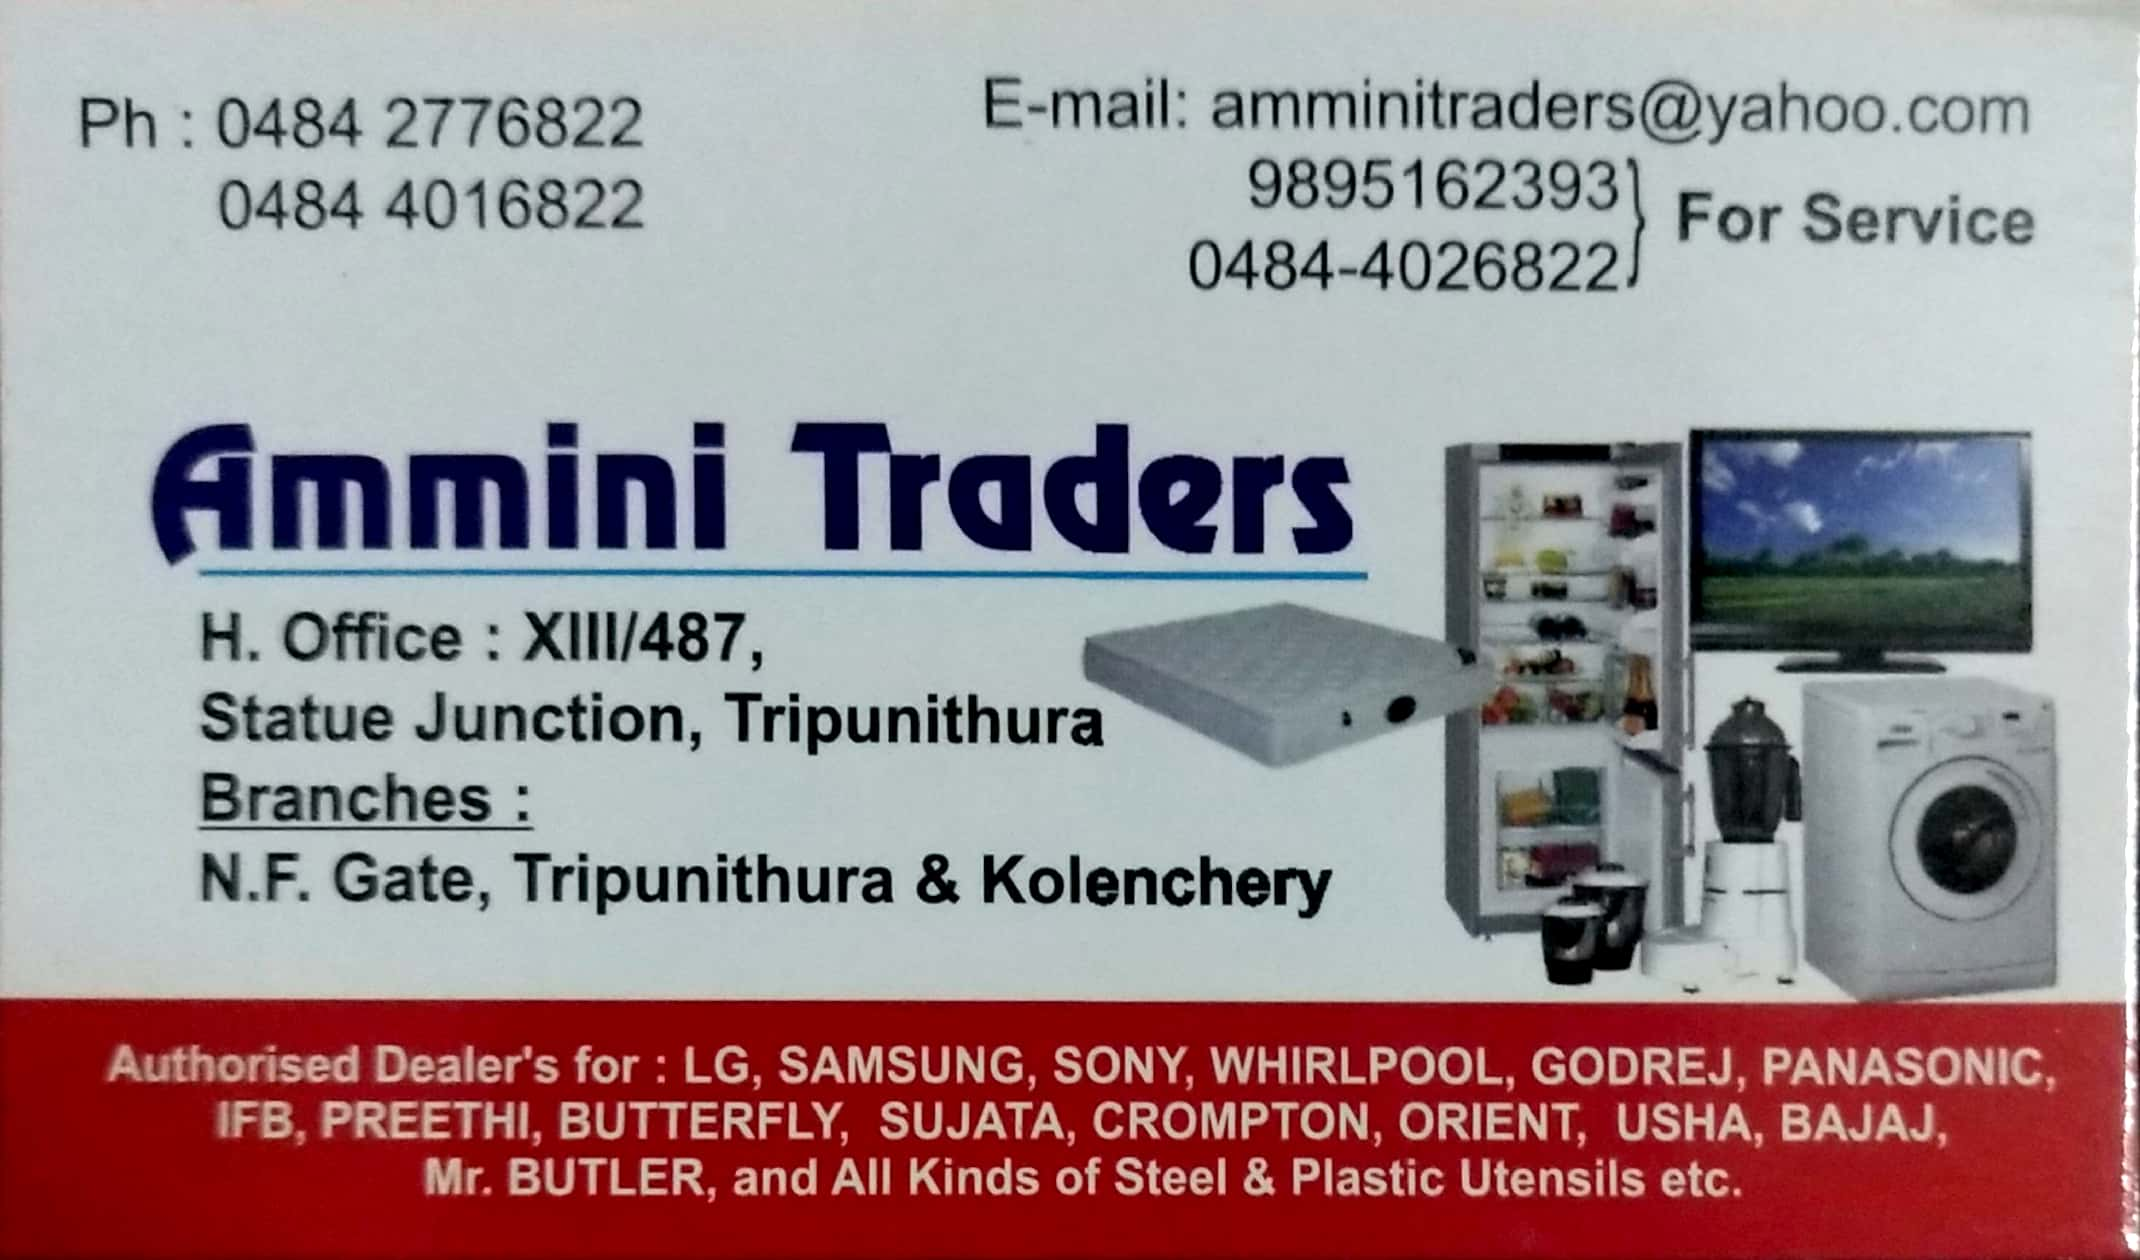 AMMINI TRADERS, ELECTRONICS,  service in Thrippunithura, Ernakulam